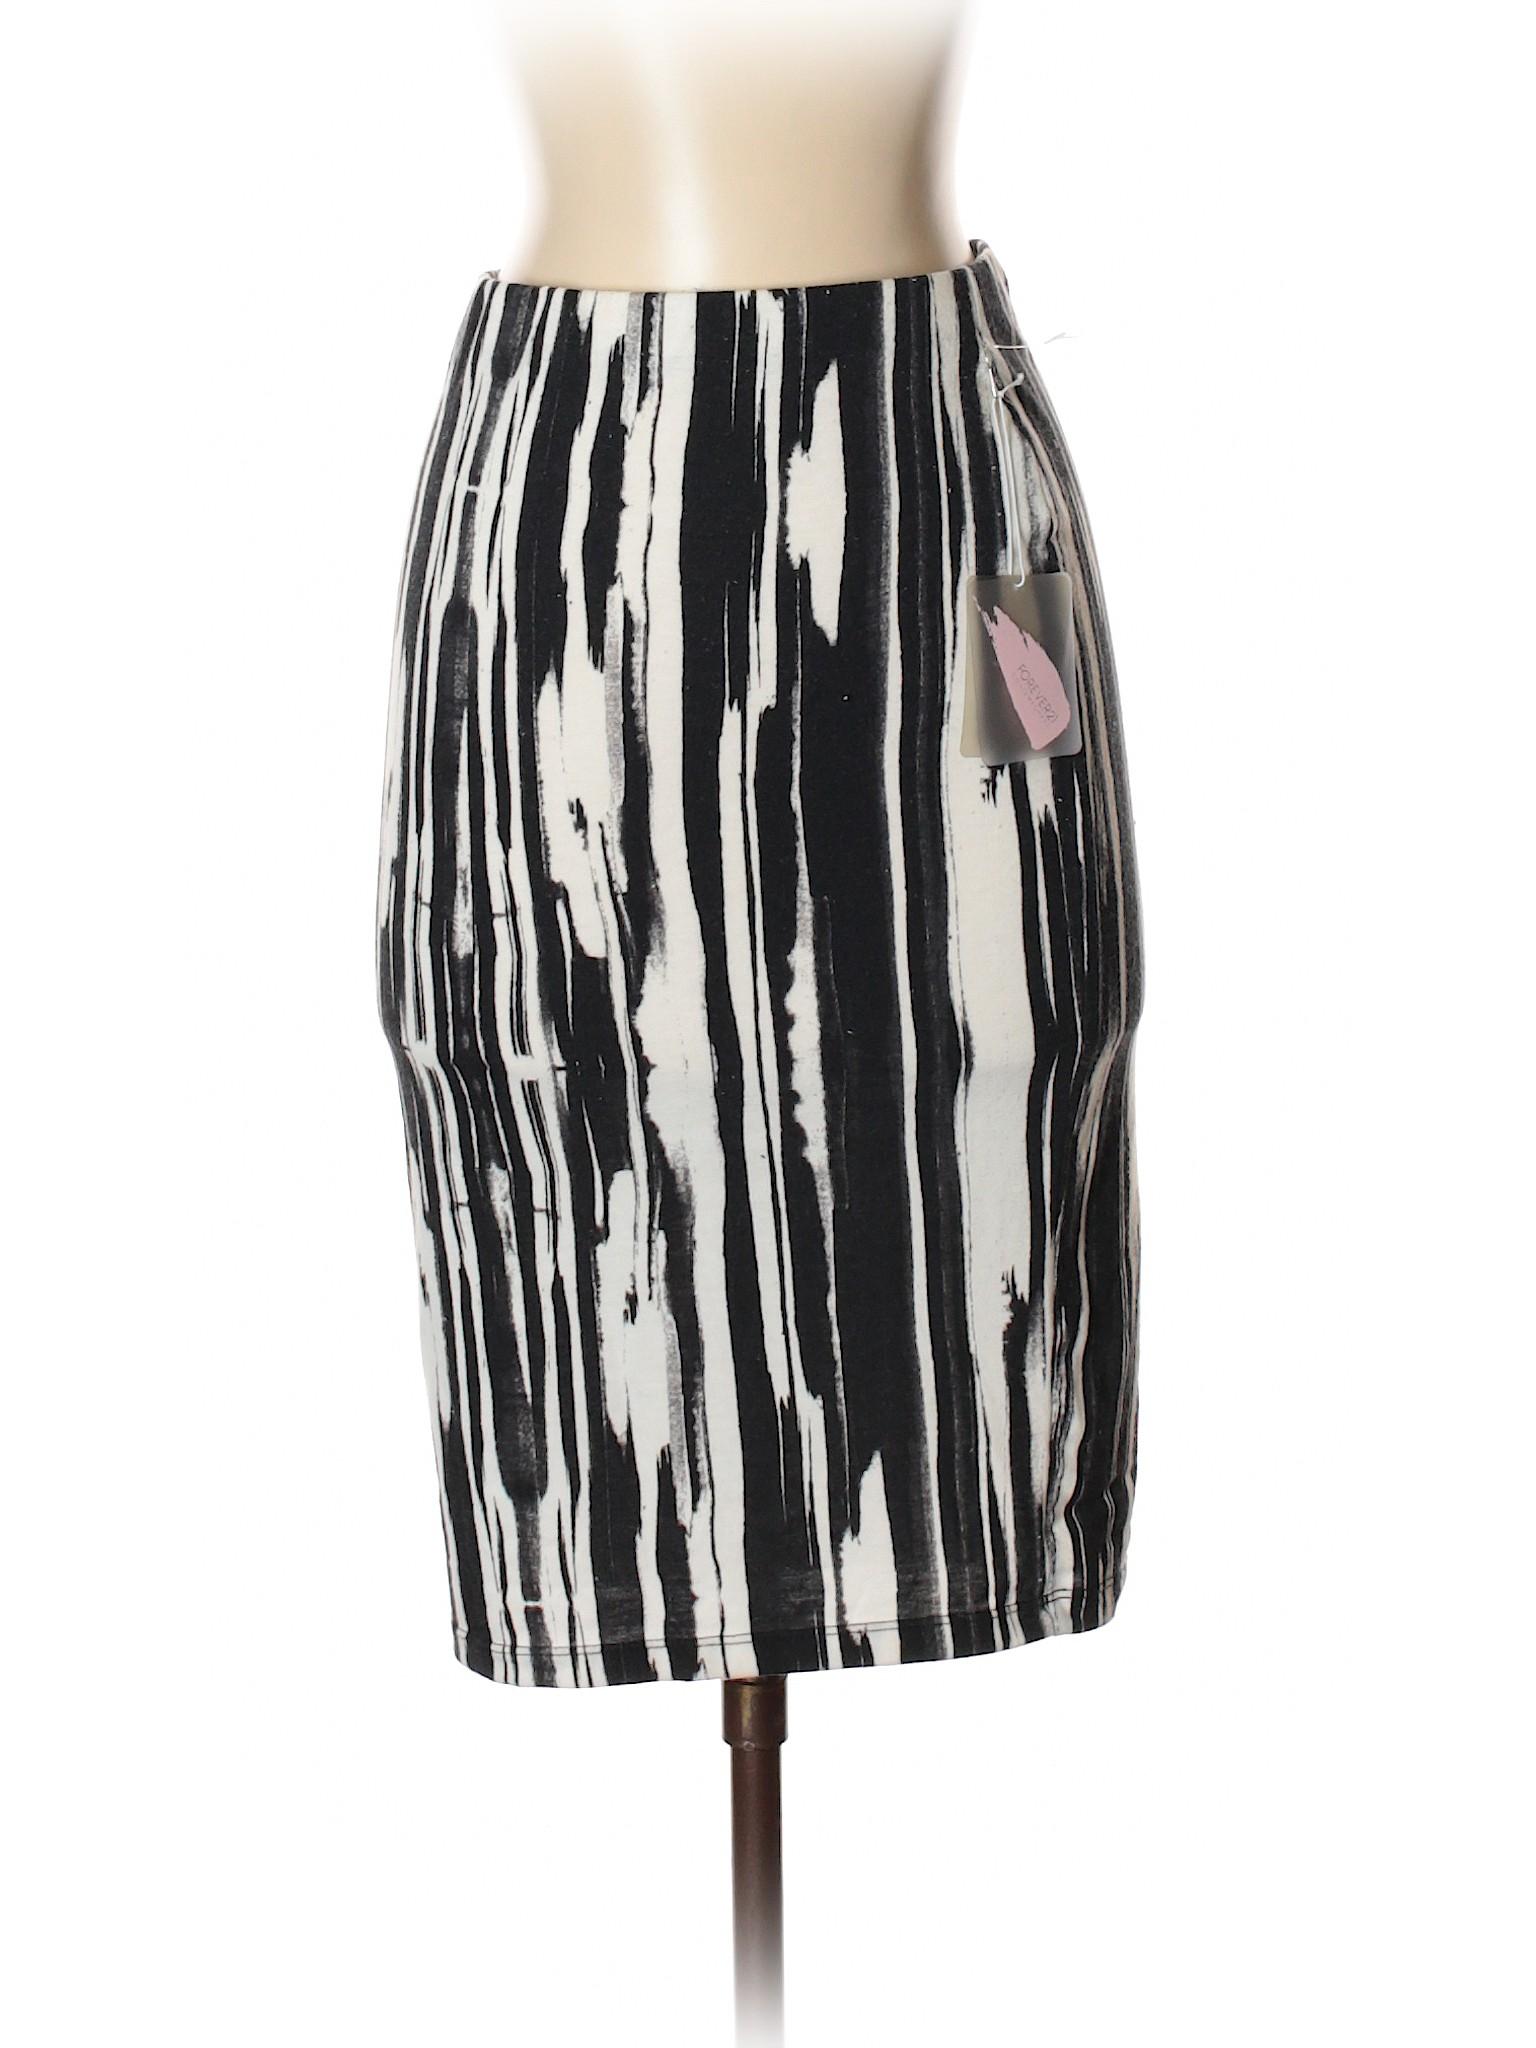 Boutique Casual 21 Skirt Forever leisure 1awaYqA7v